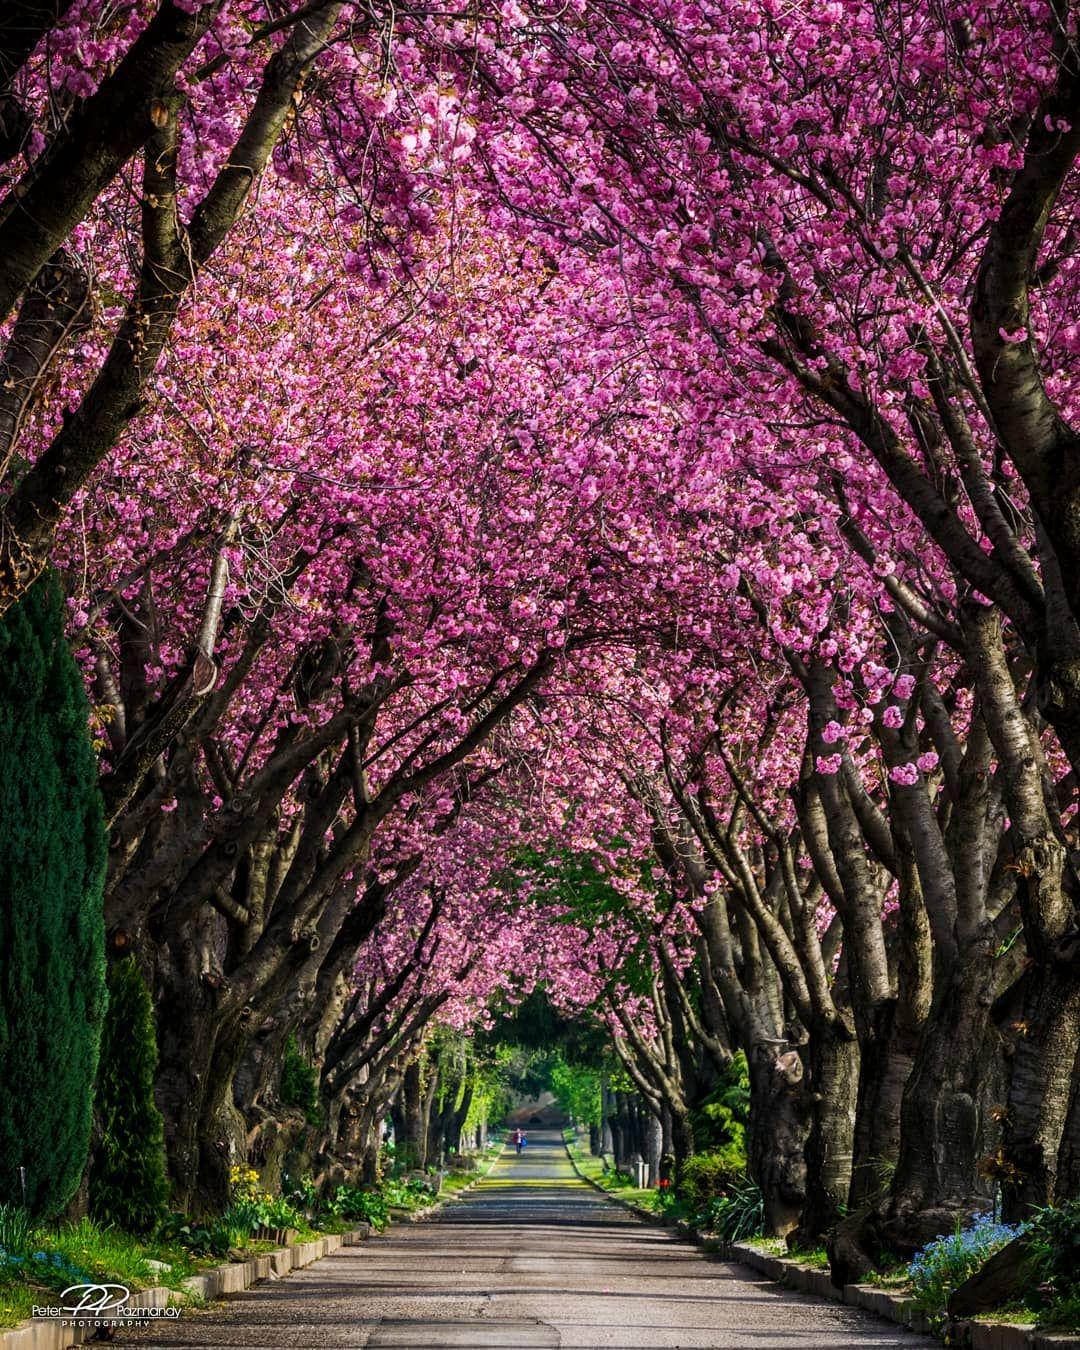 Cherry Blossoms Pecs Hungary By Peter Pazmandy Peterpazmandy On Instagram Cr Pecs Hungary Landscape Instagram